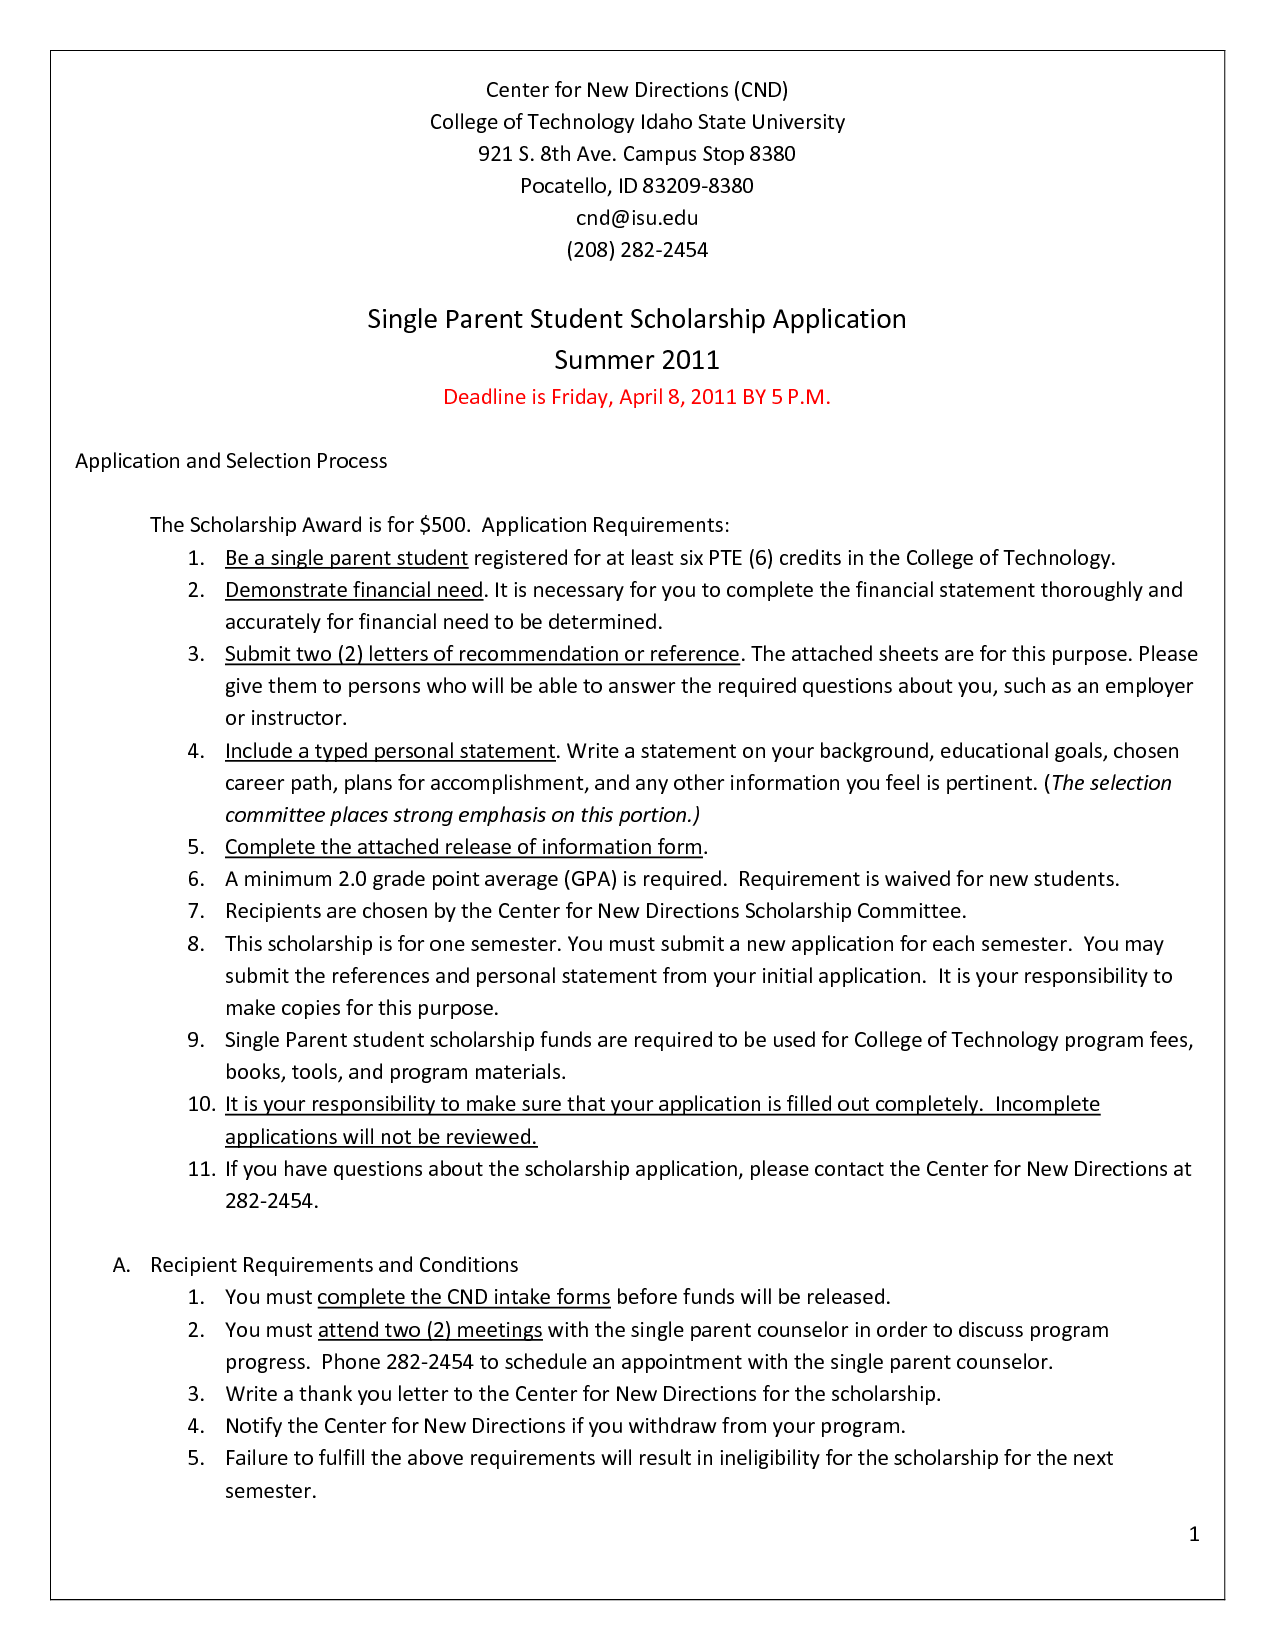 Recommendation Letter Sample For Scholarship Application Cover University